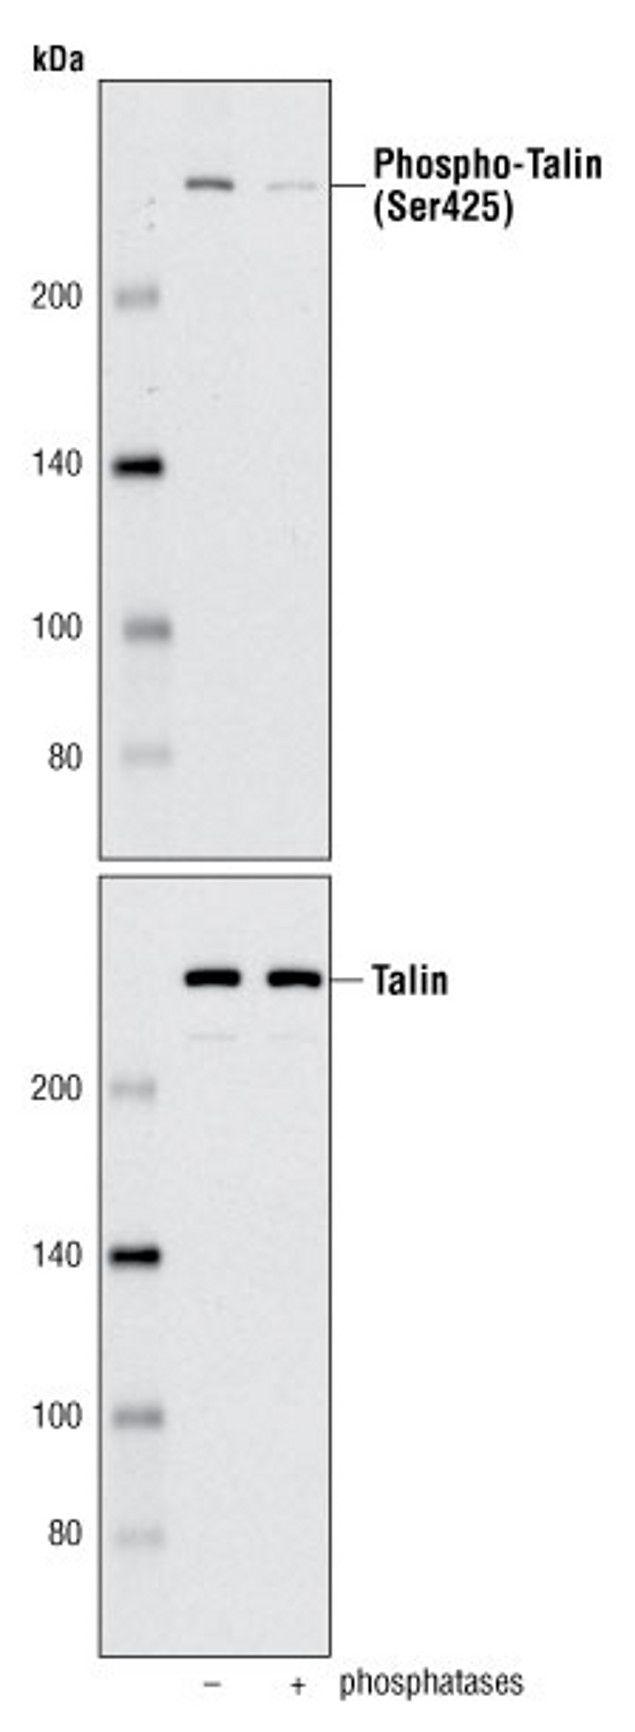 Phospho-Talin (Ser425) Antibody (A16690) in Western Blot